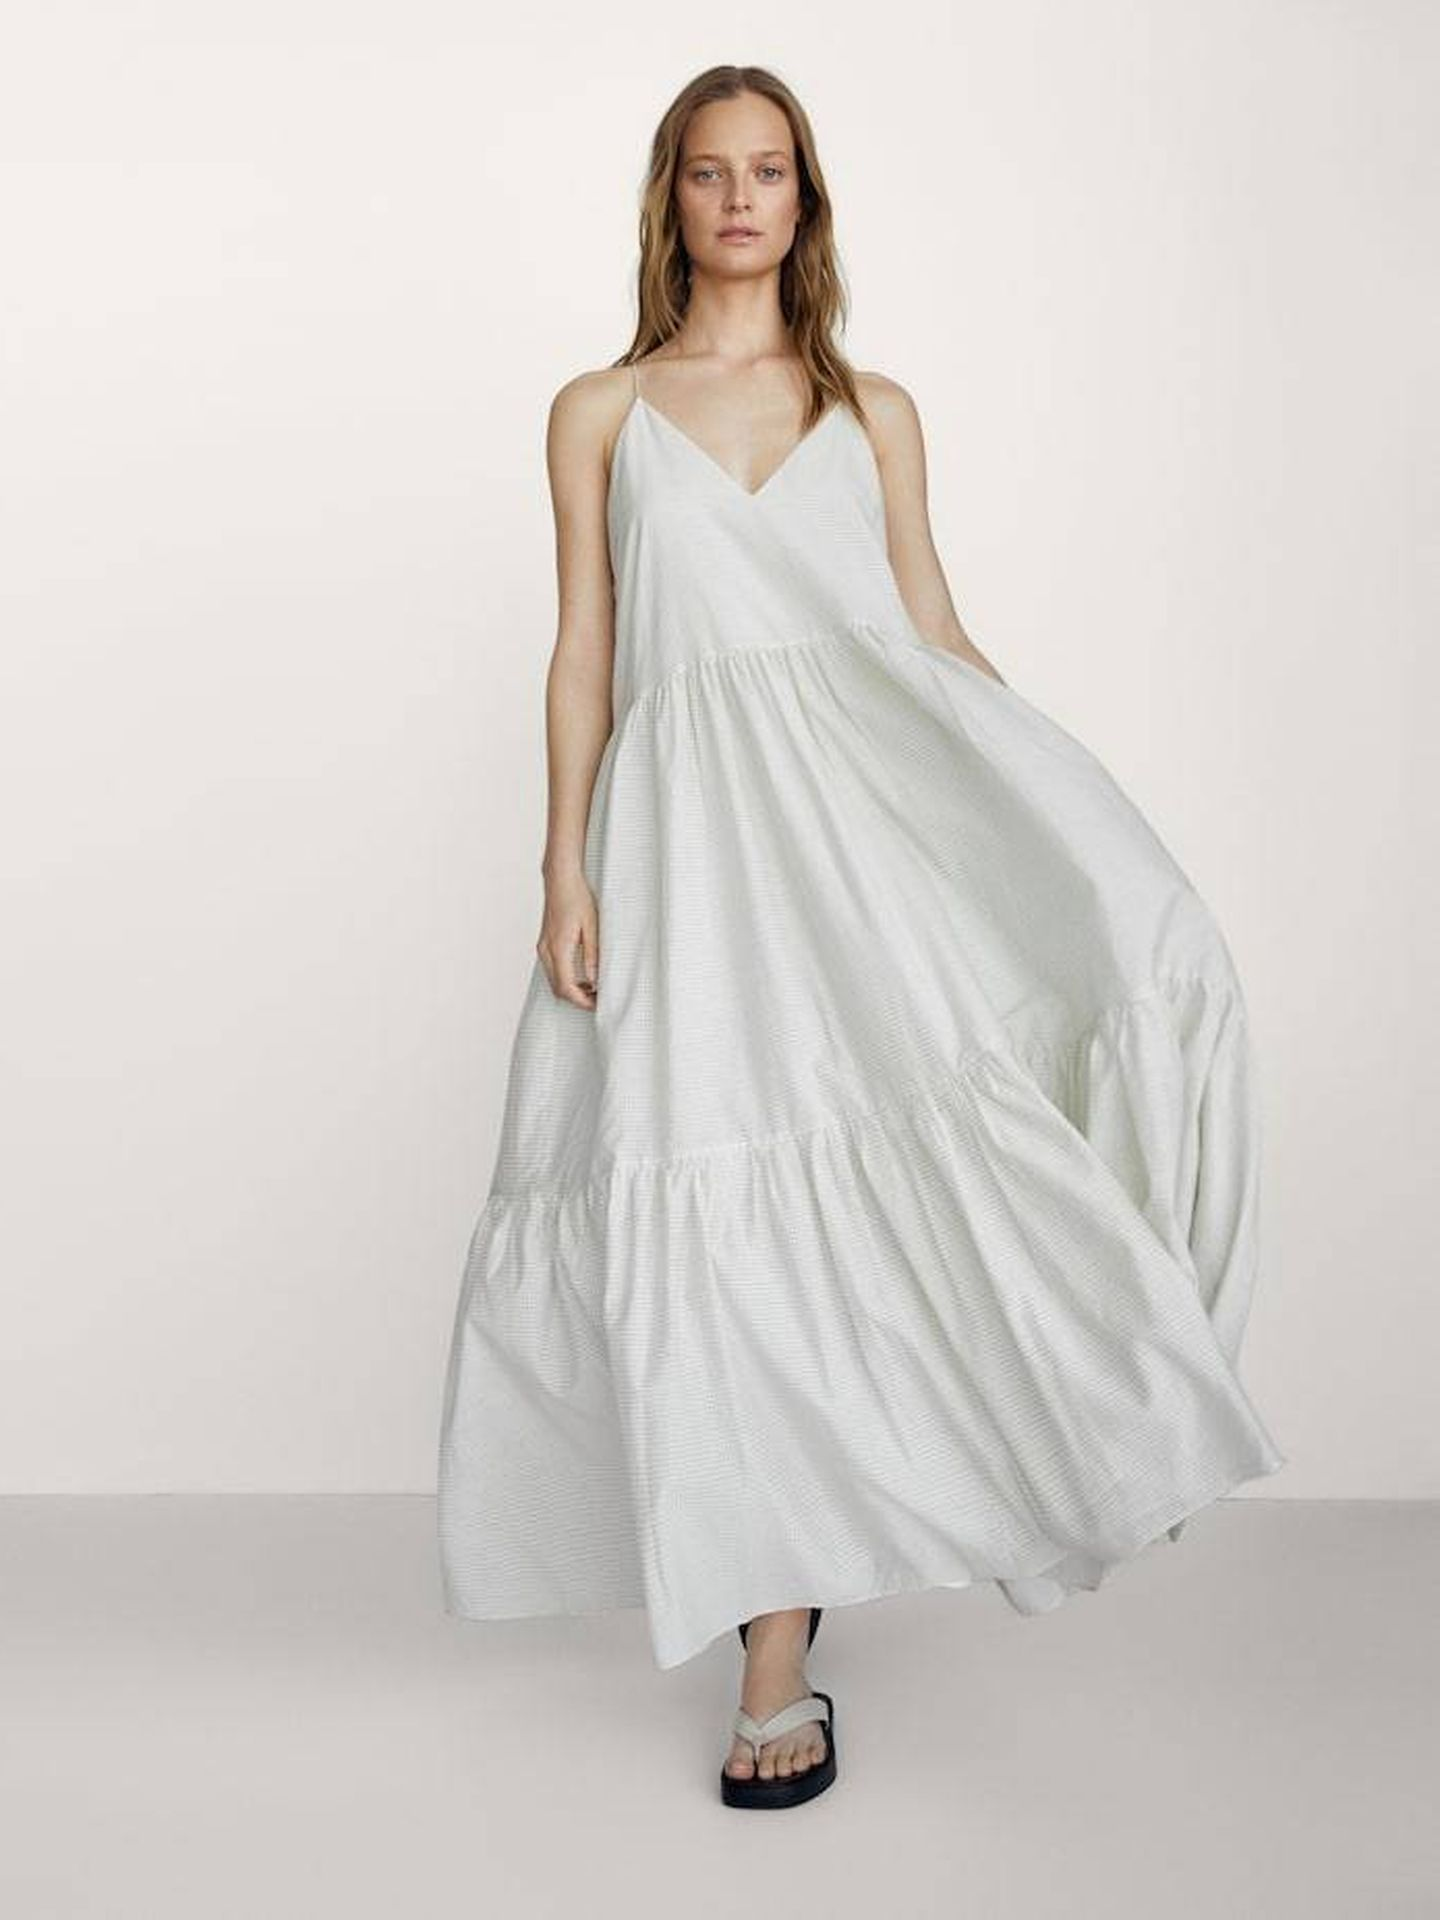 Vestido de cuadros de Massimo Dutti. (Cortesía)